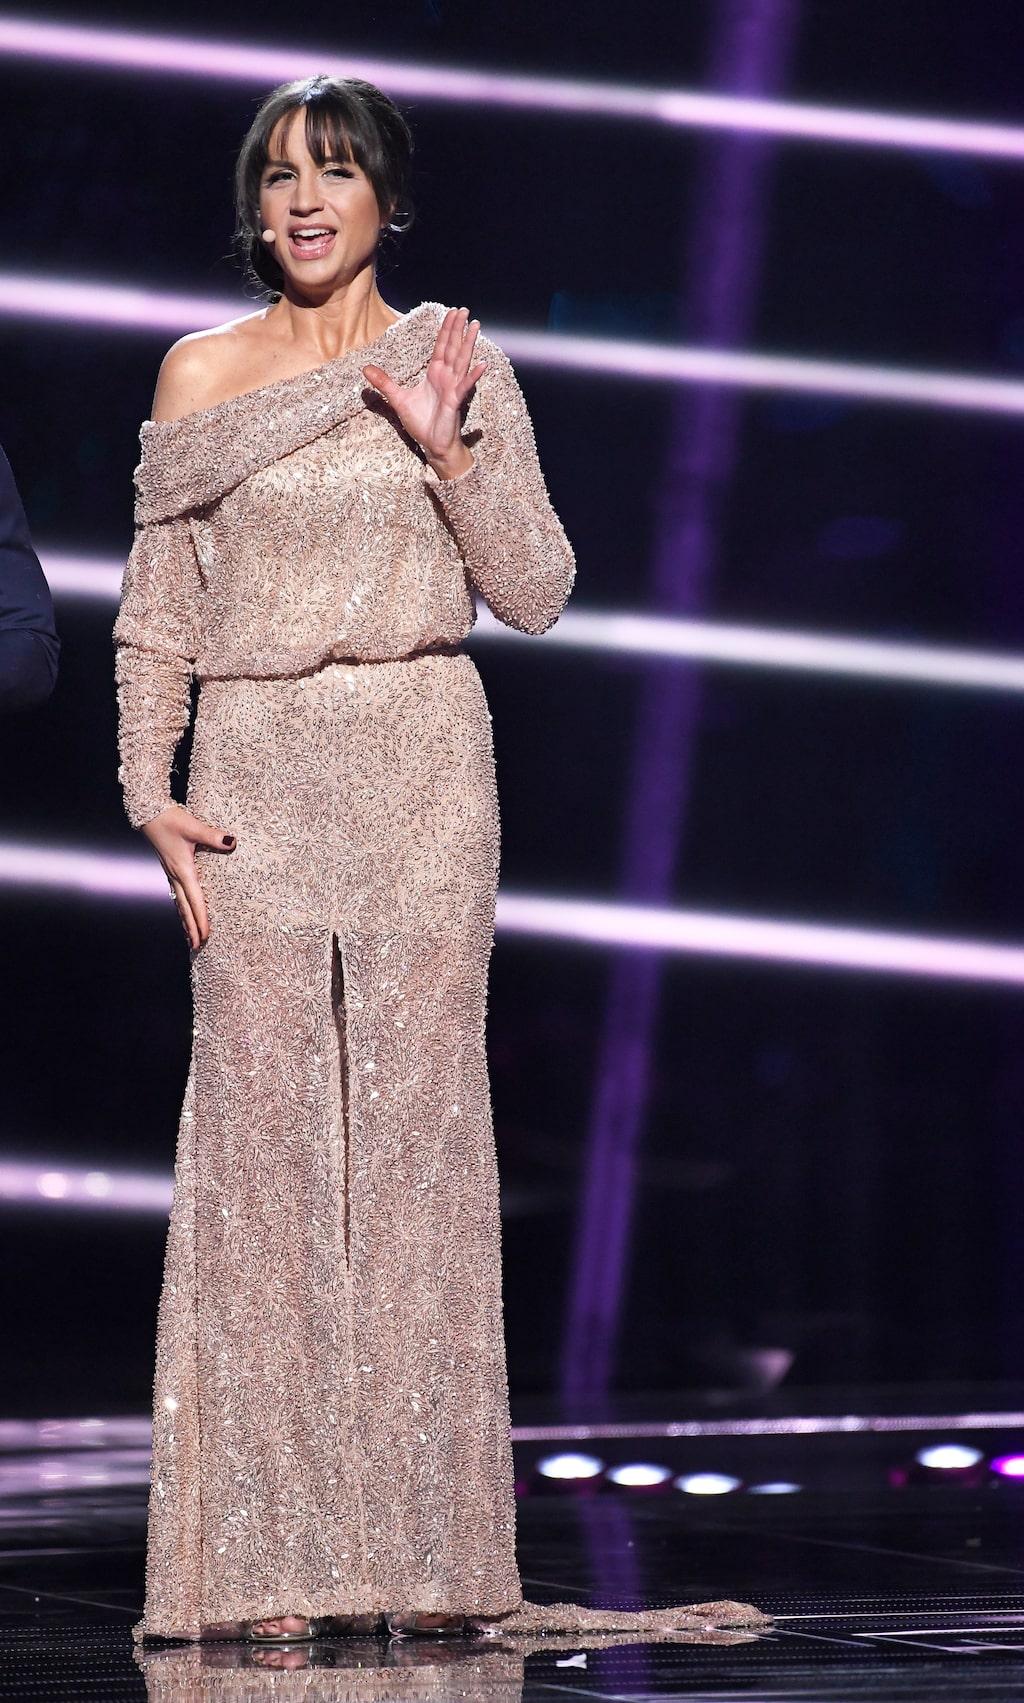 Petra Mede, Eurovision Song Contest, 2016